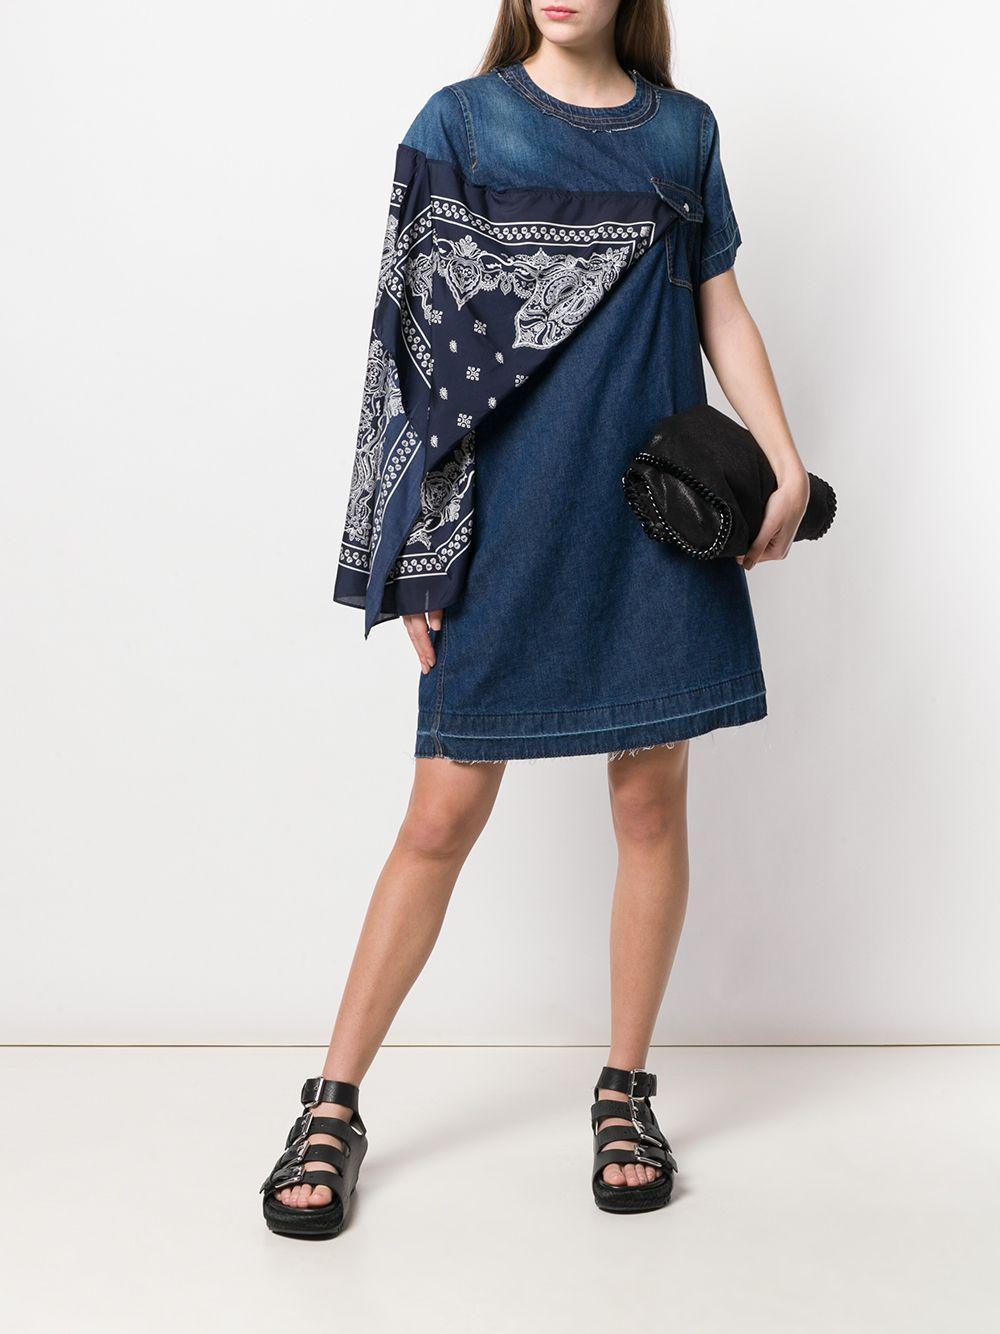 818dccec7a Sacai Scarf Detail Denim Dress in Blue - Lyst